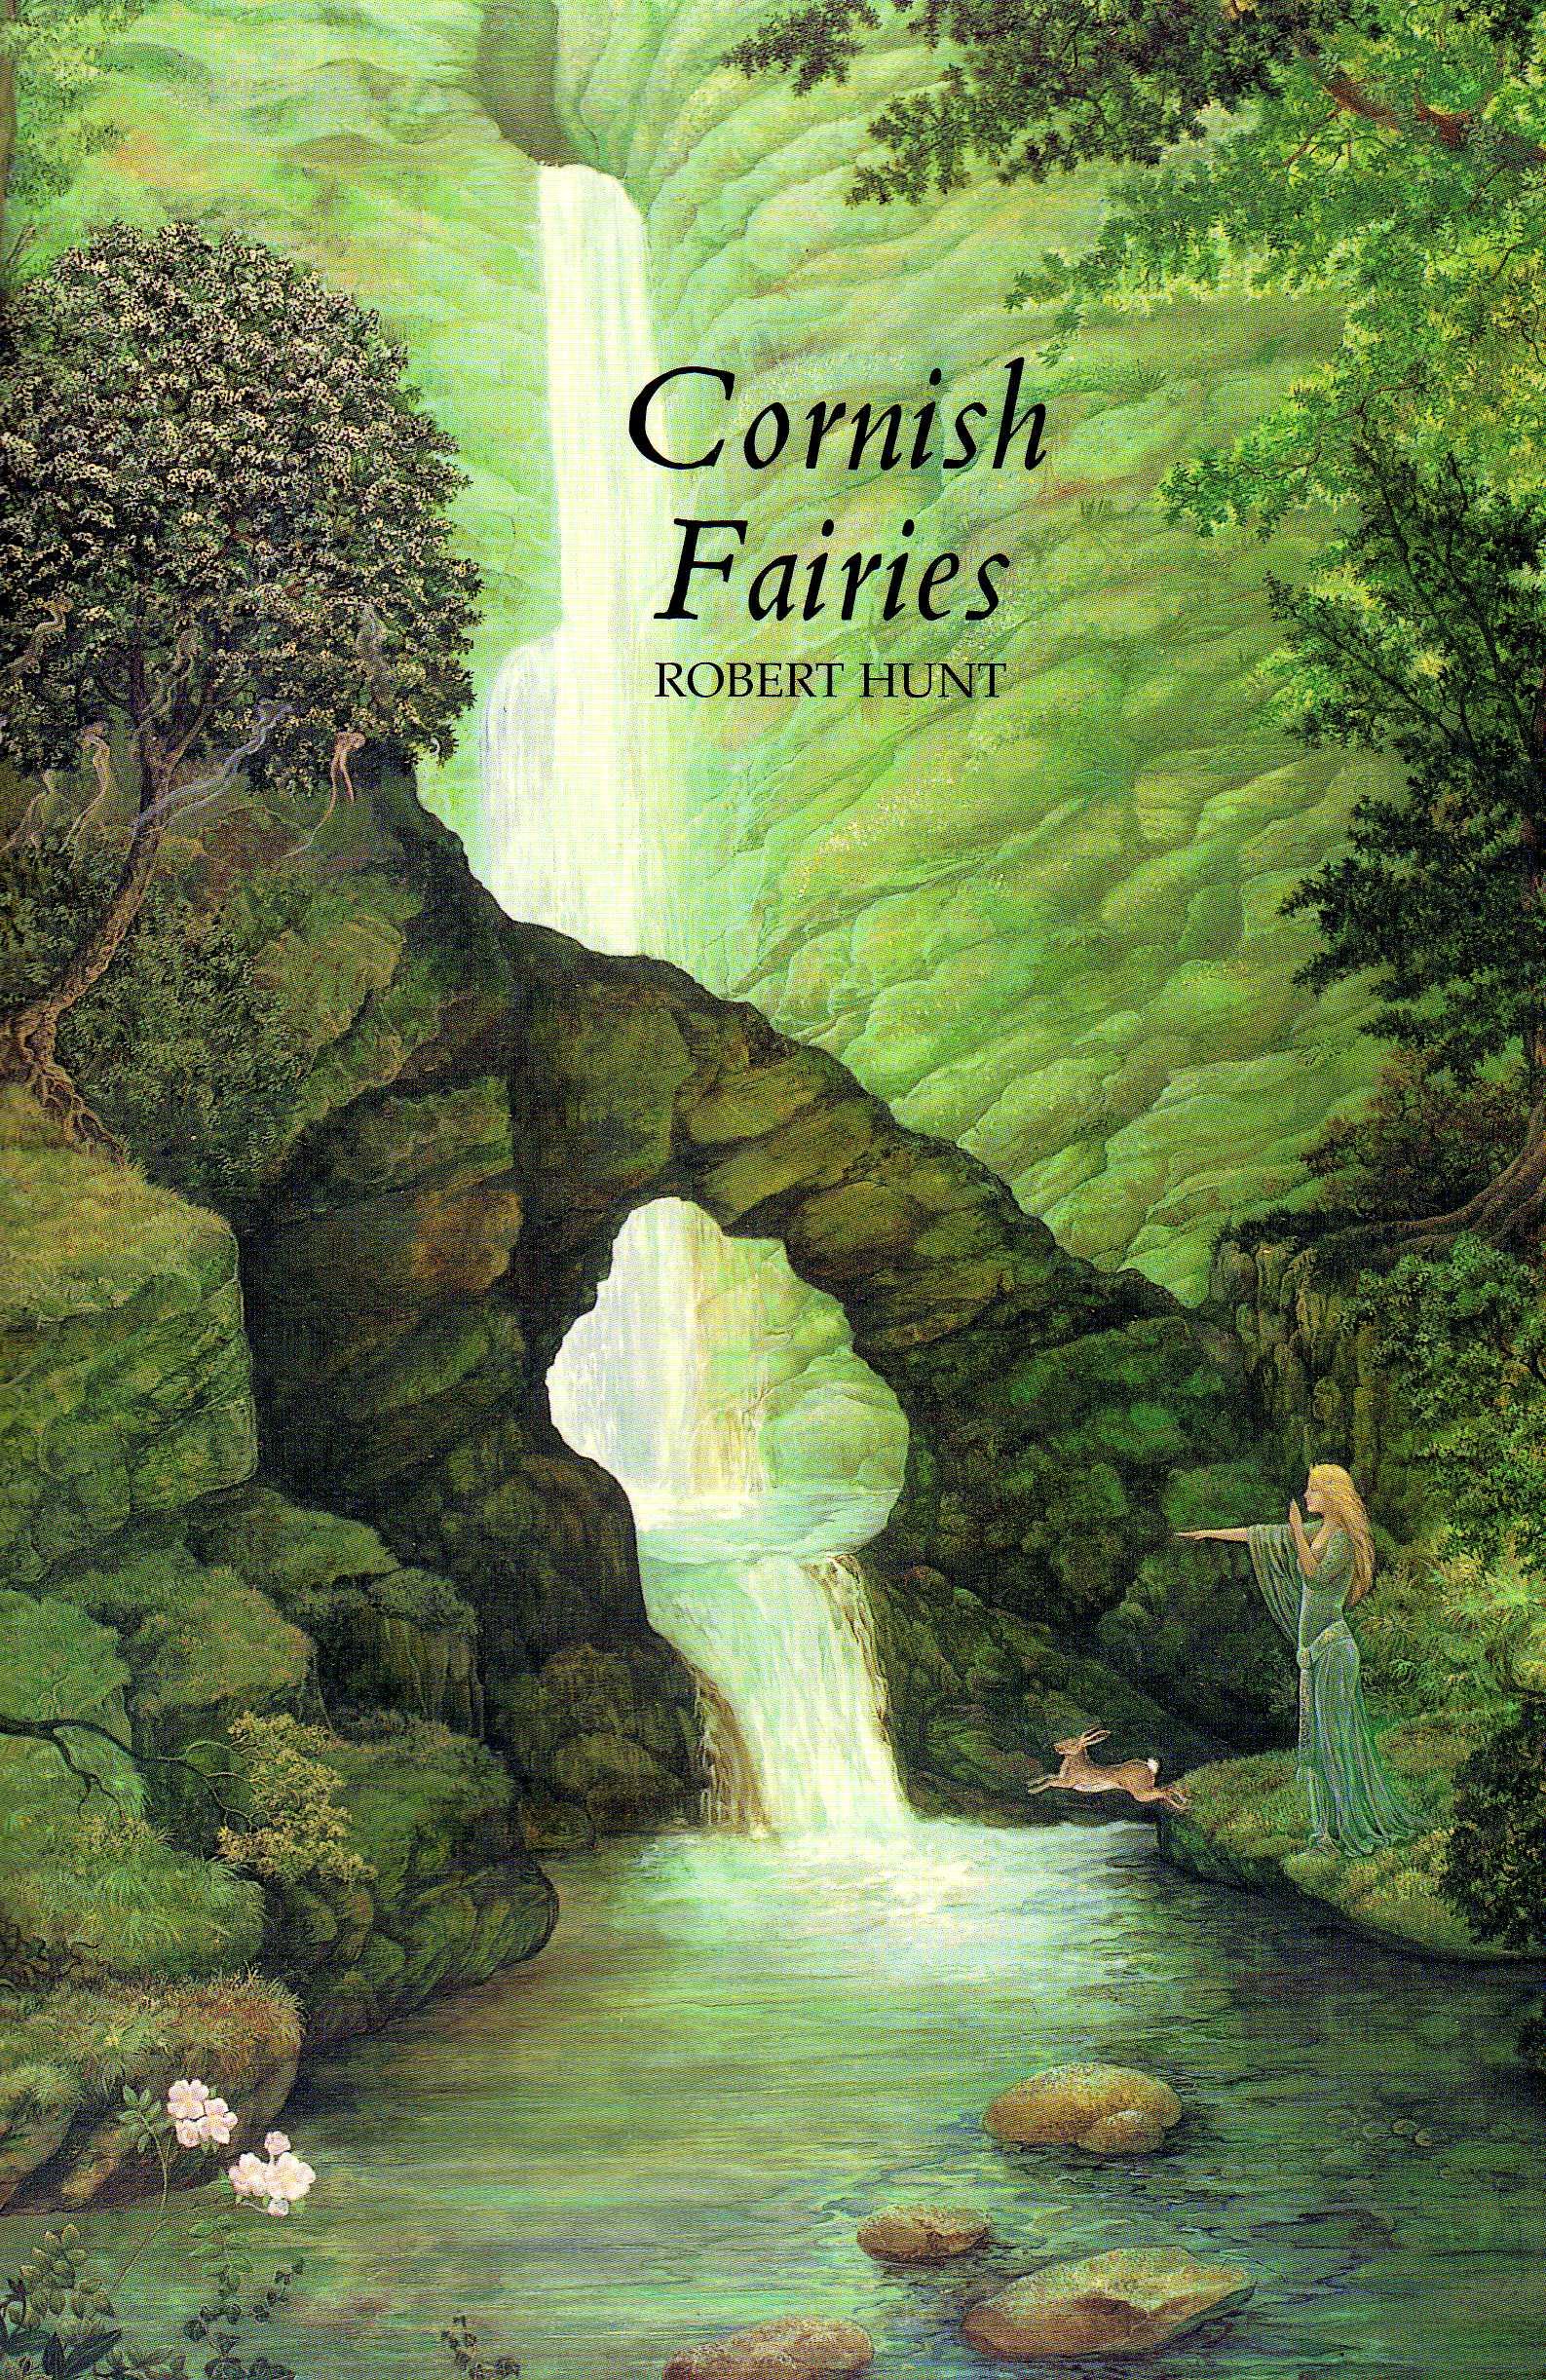 Cornish Fairies